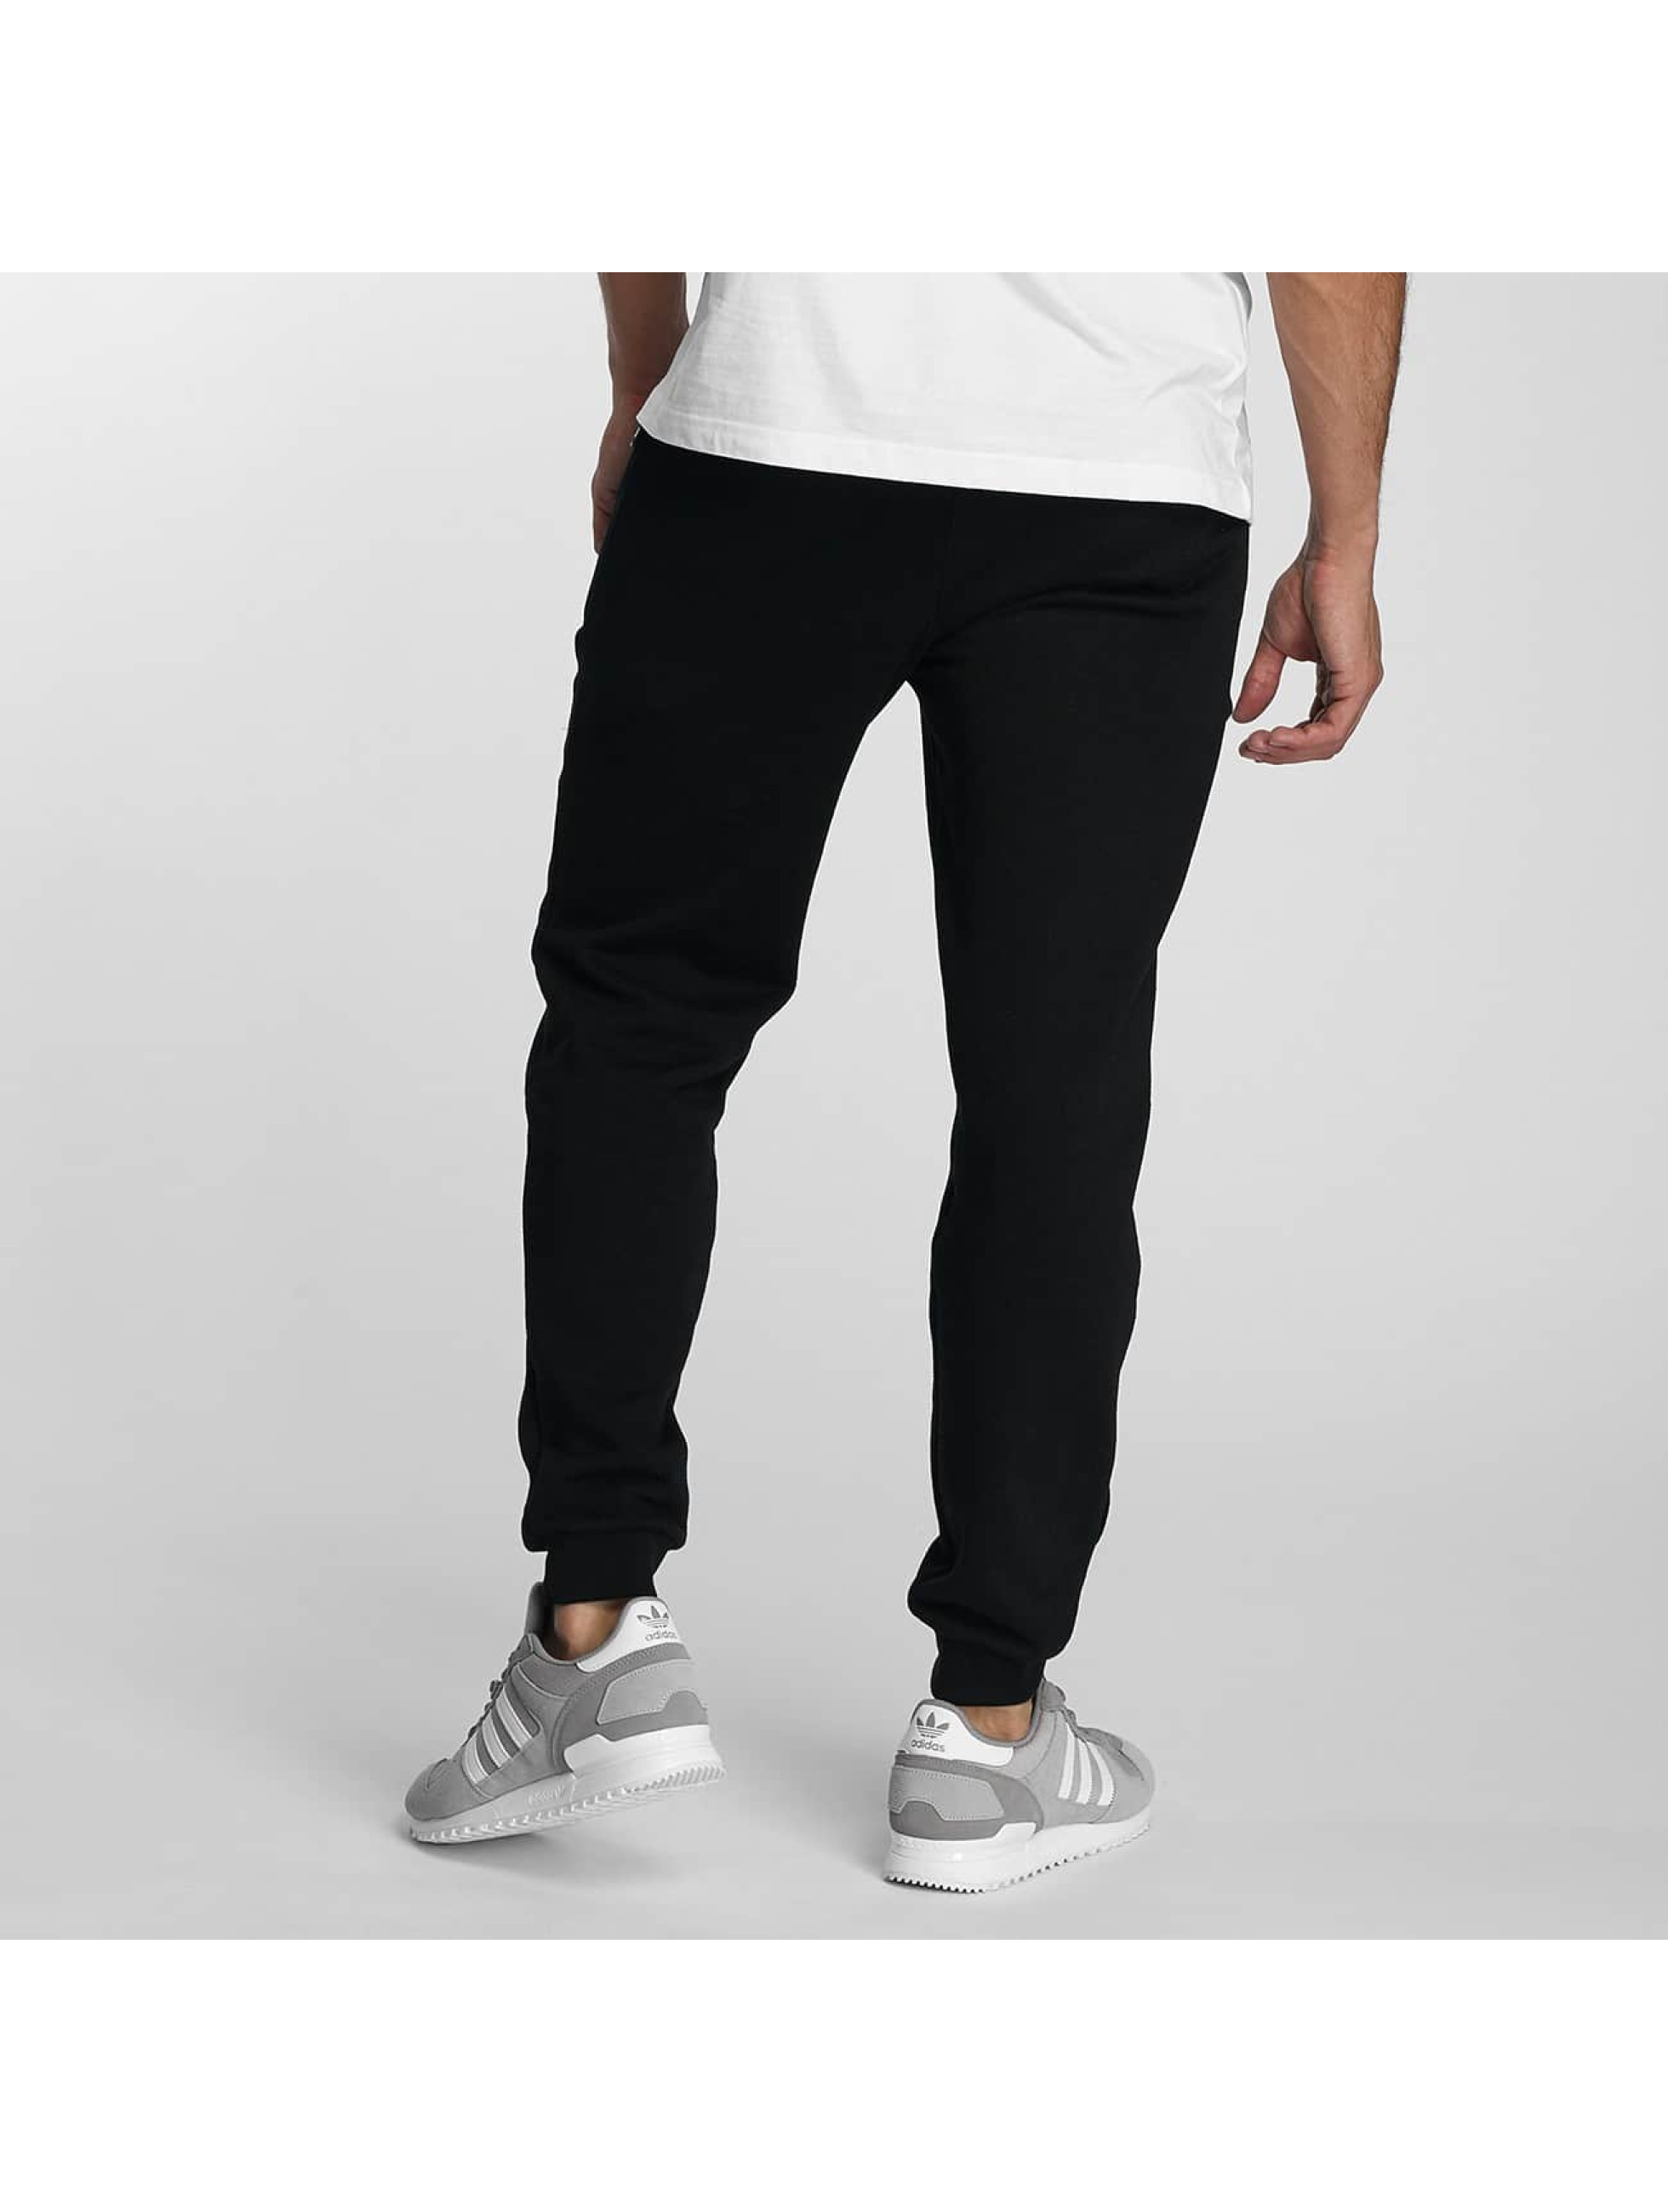 Pusher Apparel joggingbroek 215 Jacking zwart